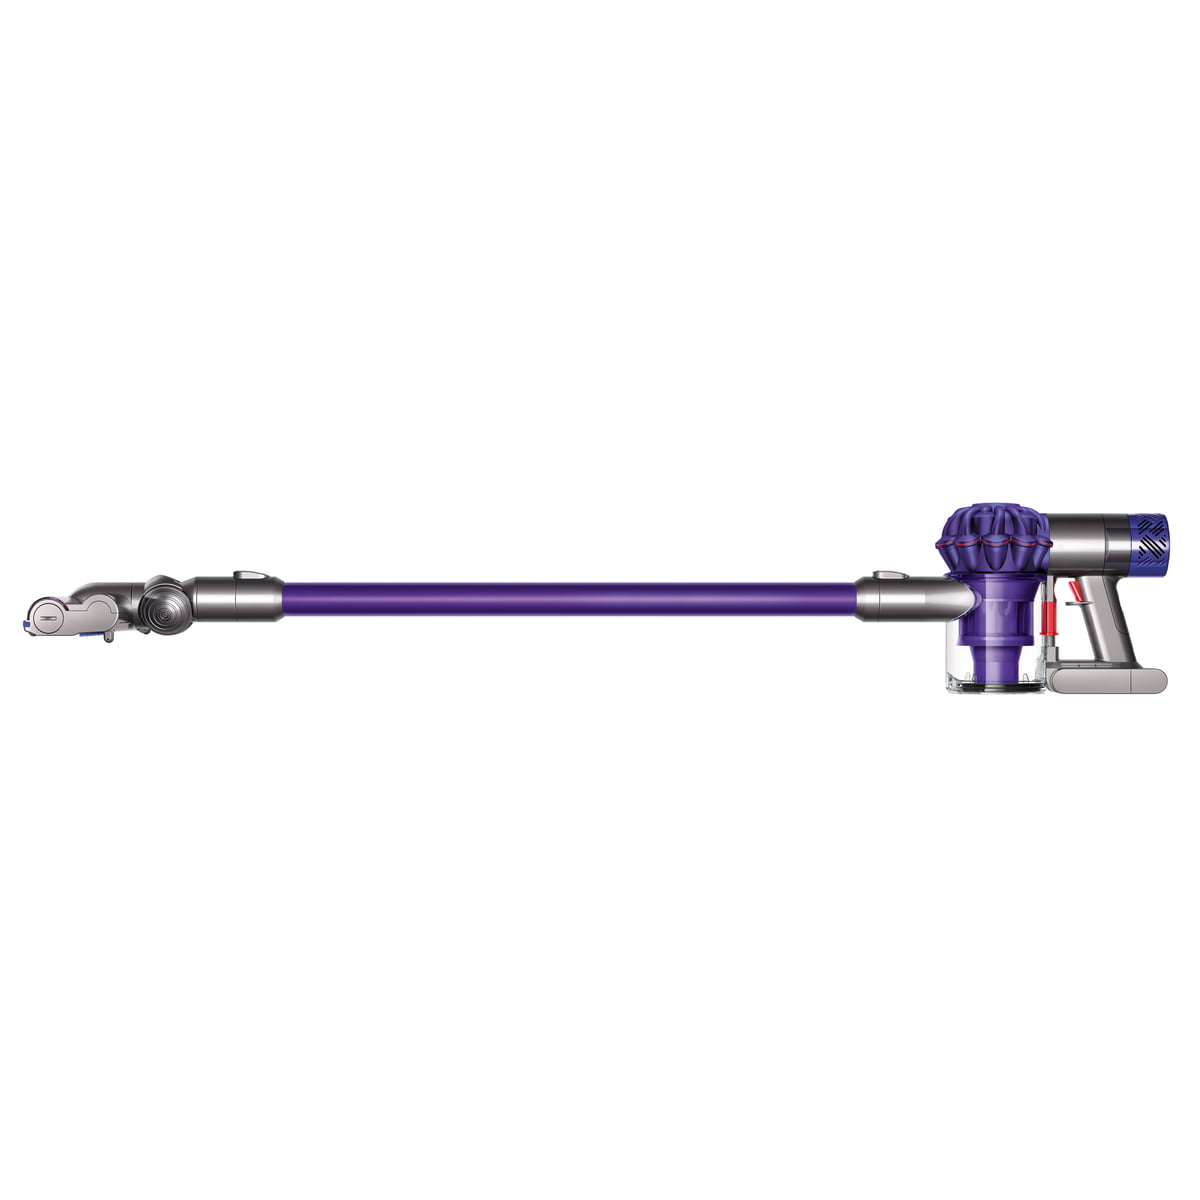 Image of: Handheld Vacuum Dyson Cordless Vacuum Cleaner V6 Animalpro Purple Purple Connox Cordless Vacuum Cleaner V6 Animalpro